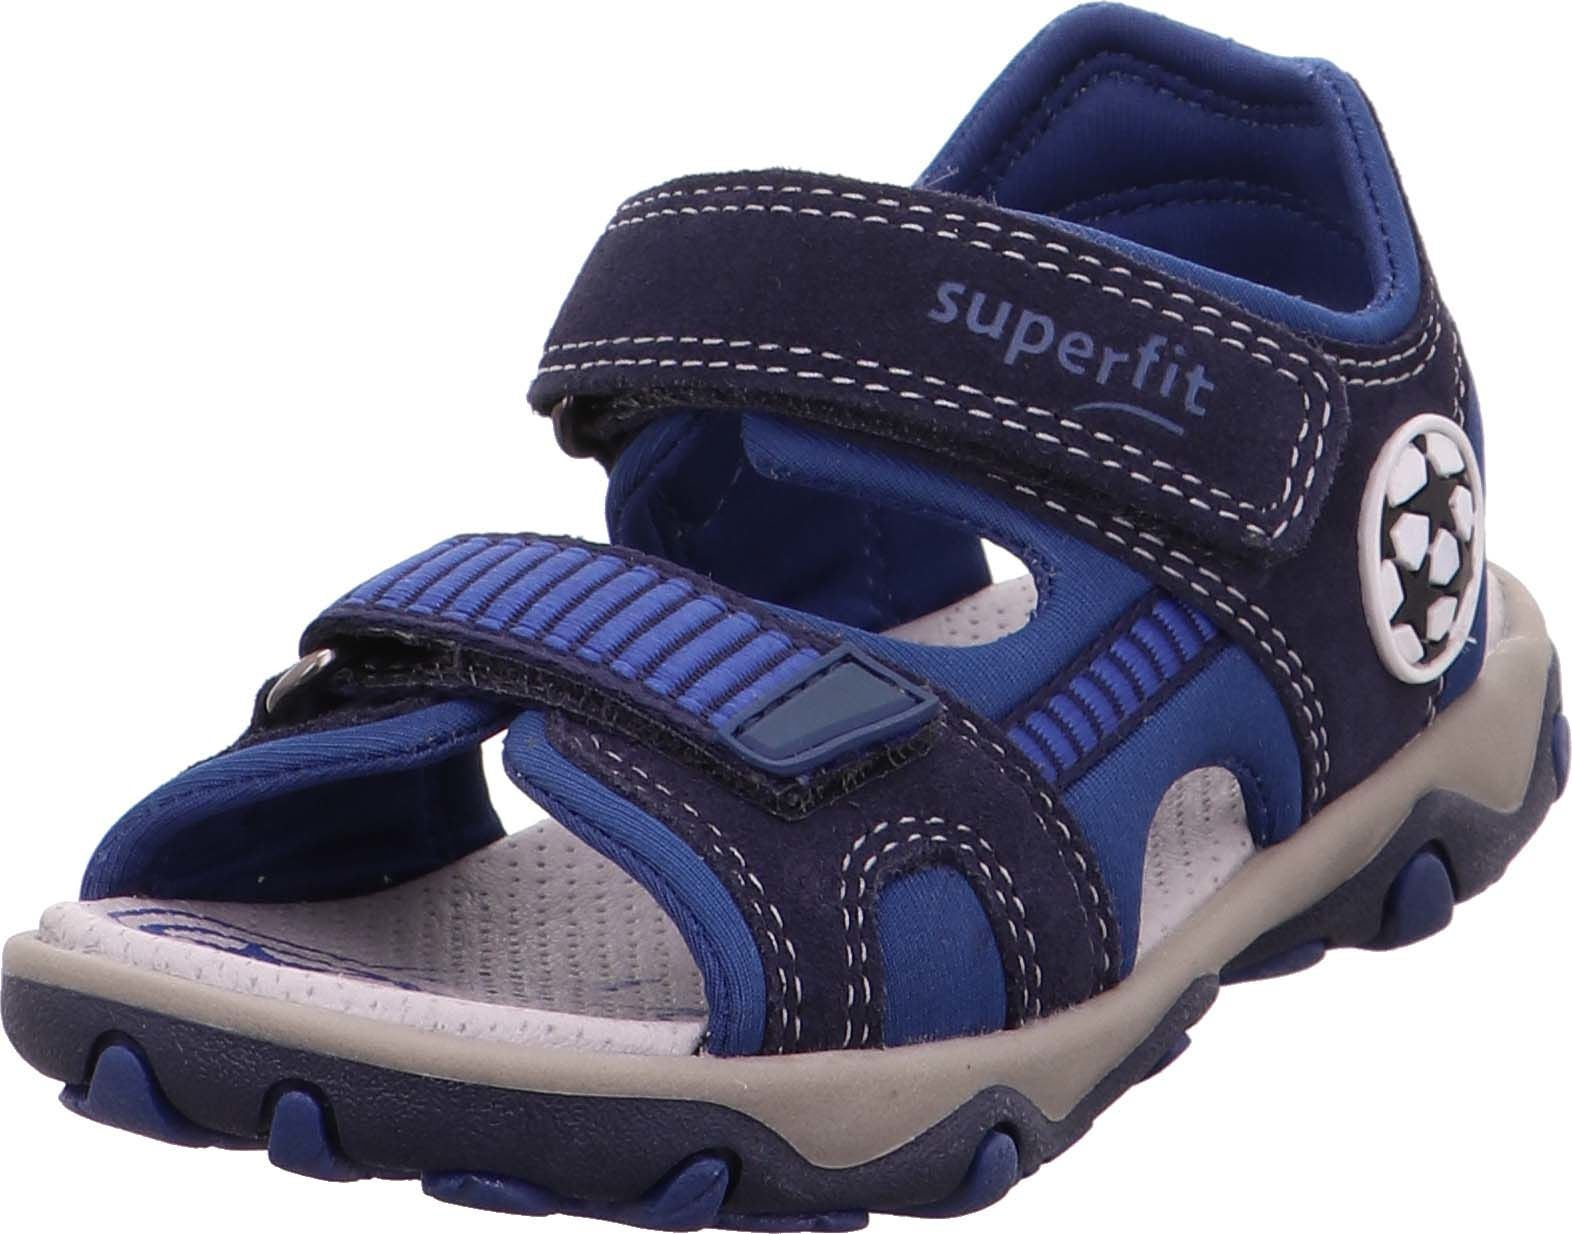 Superfit Mike 3.0 Sandal, Blue, 32